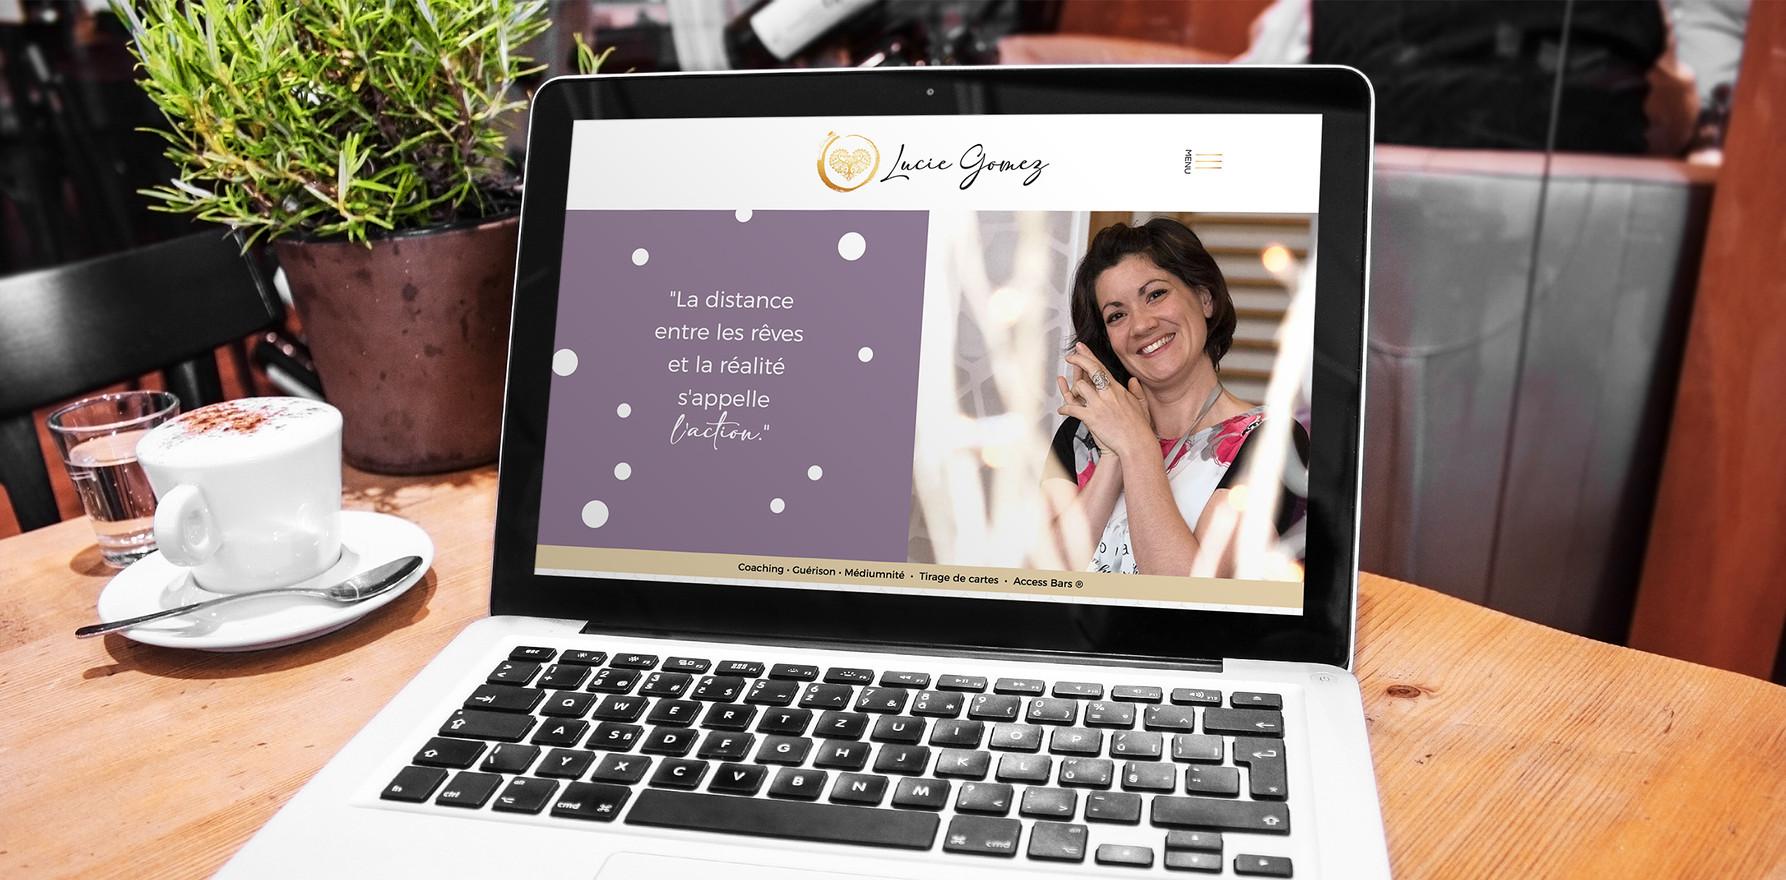 Lucie Gomez - Personal & BusinessCoach